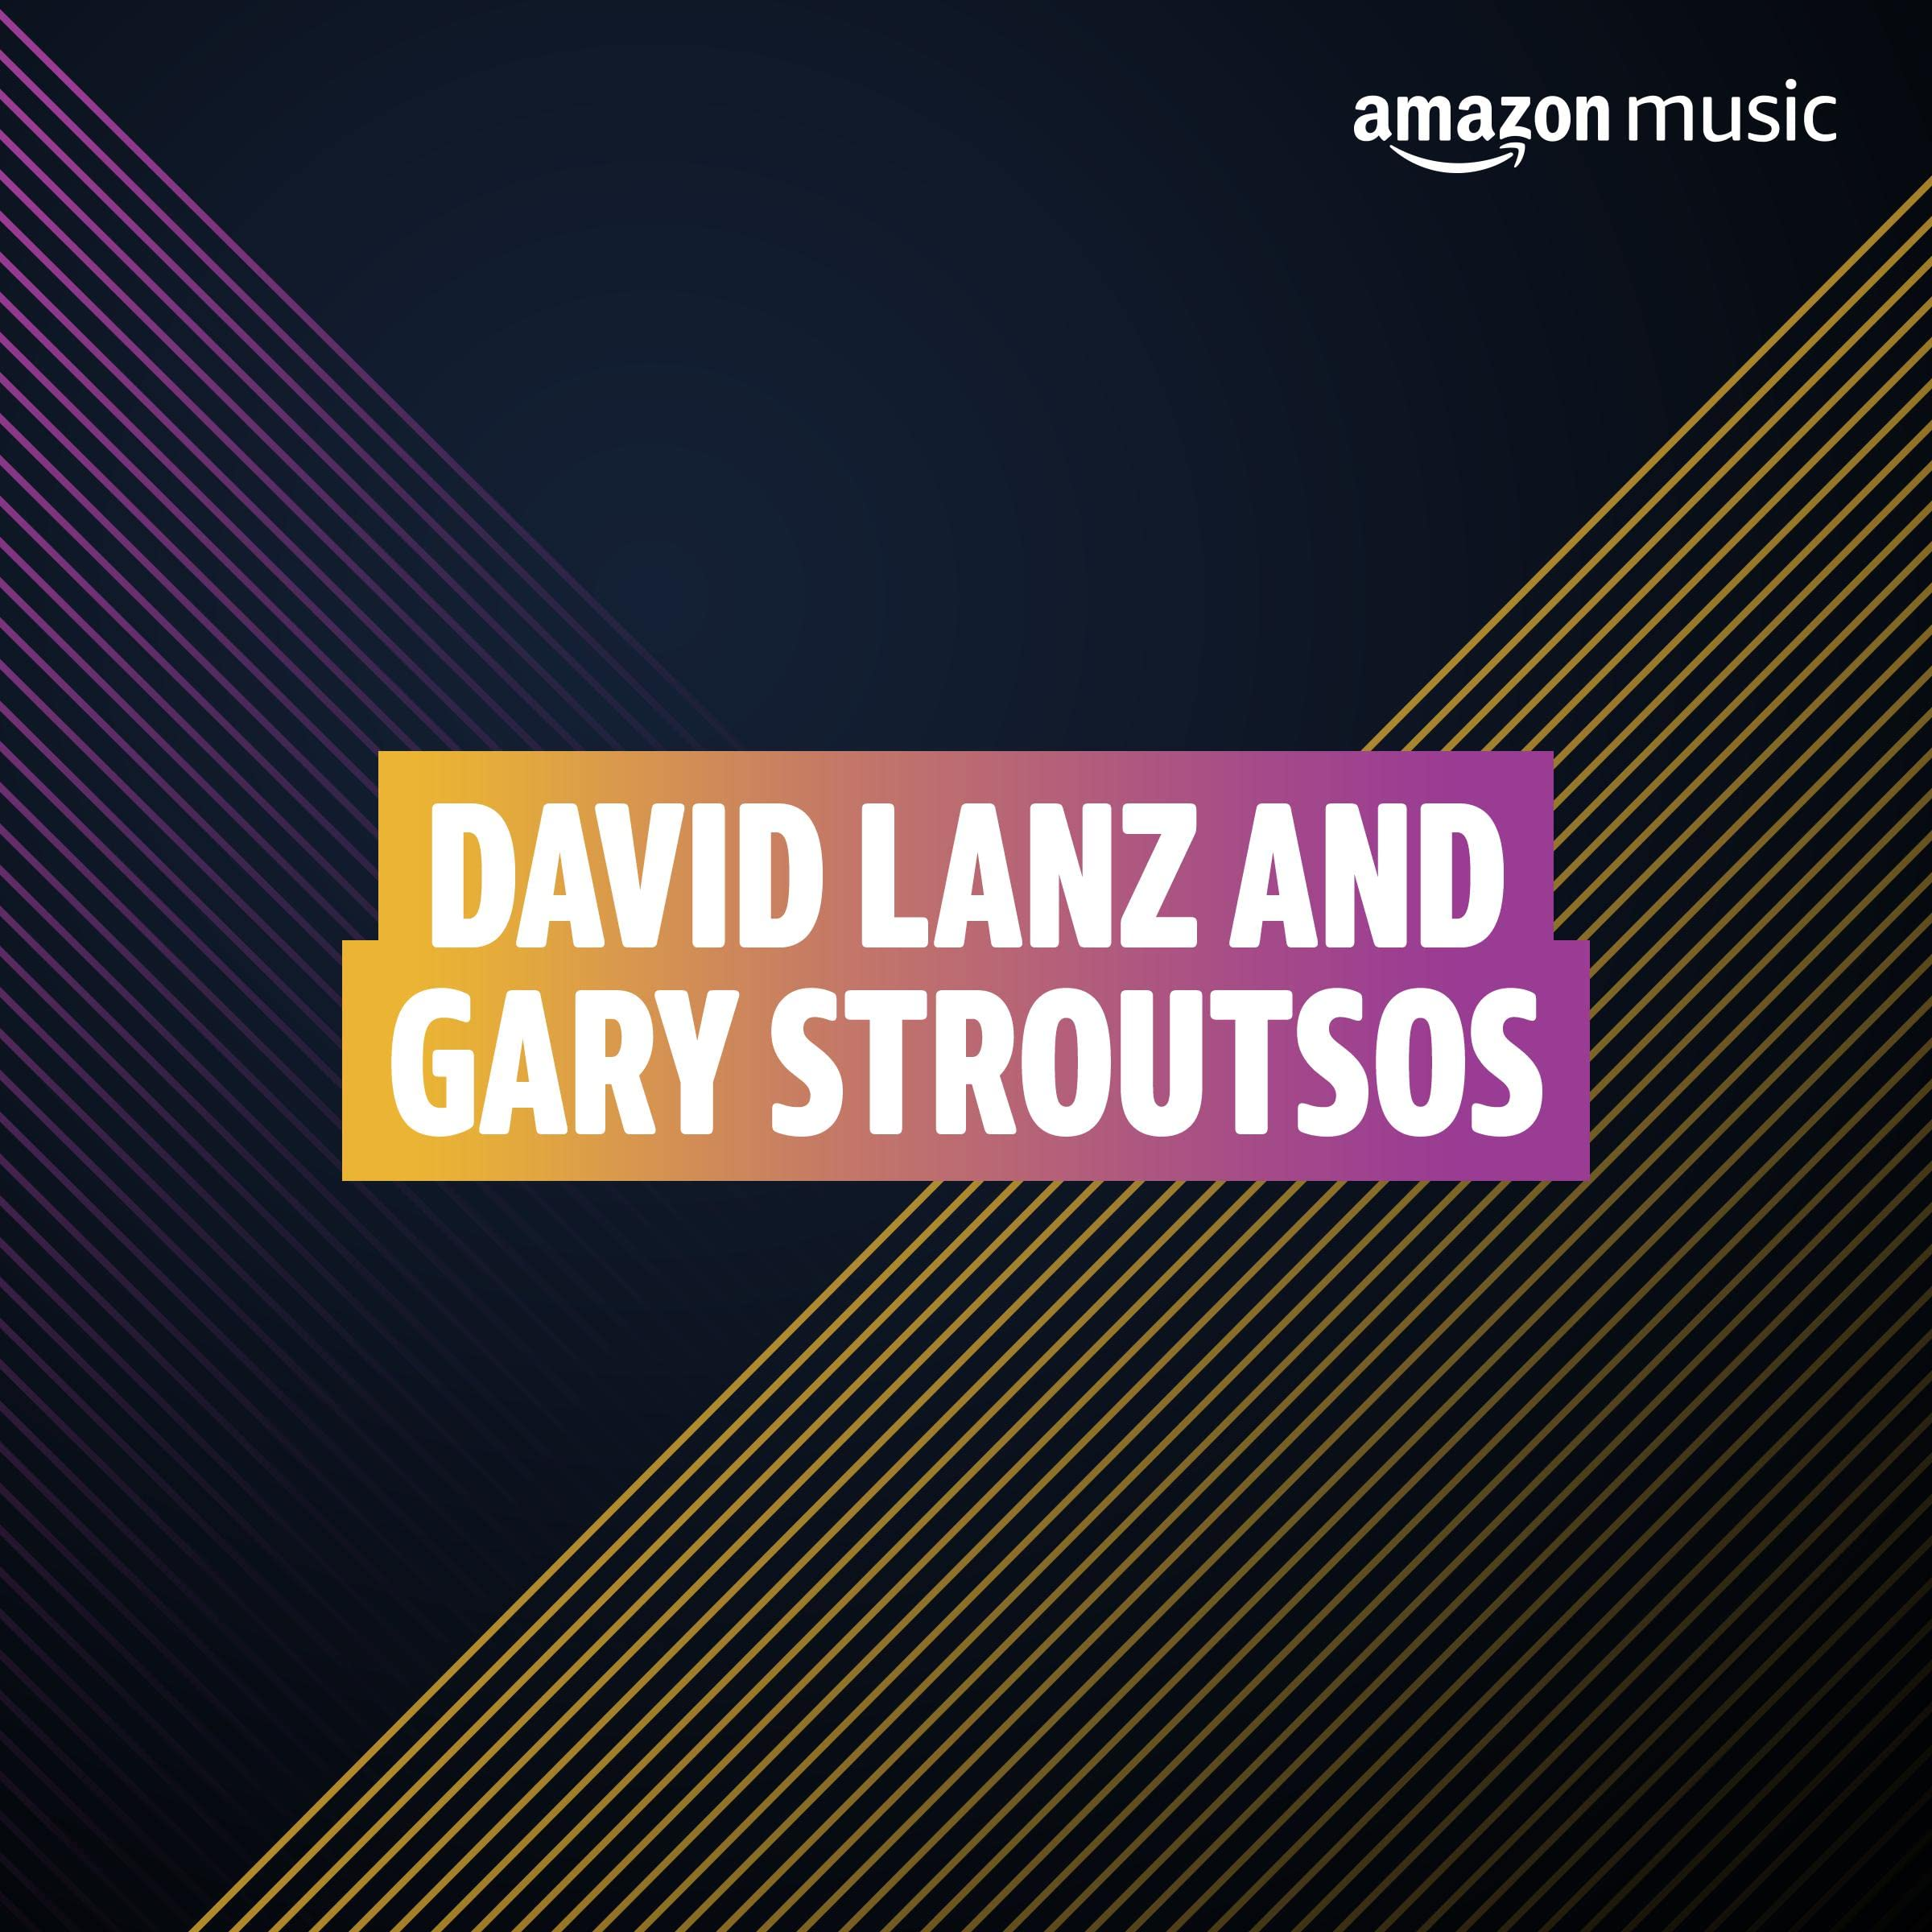 David Lanz And Gary Stroutsos